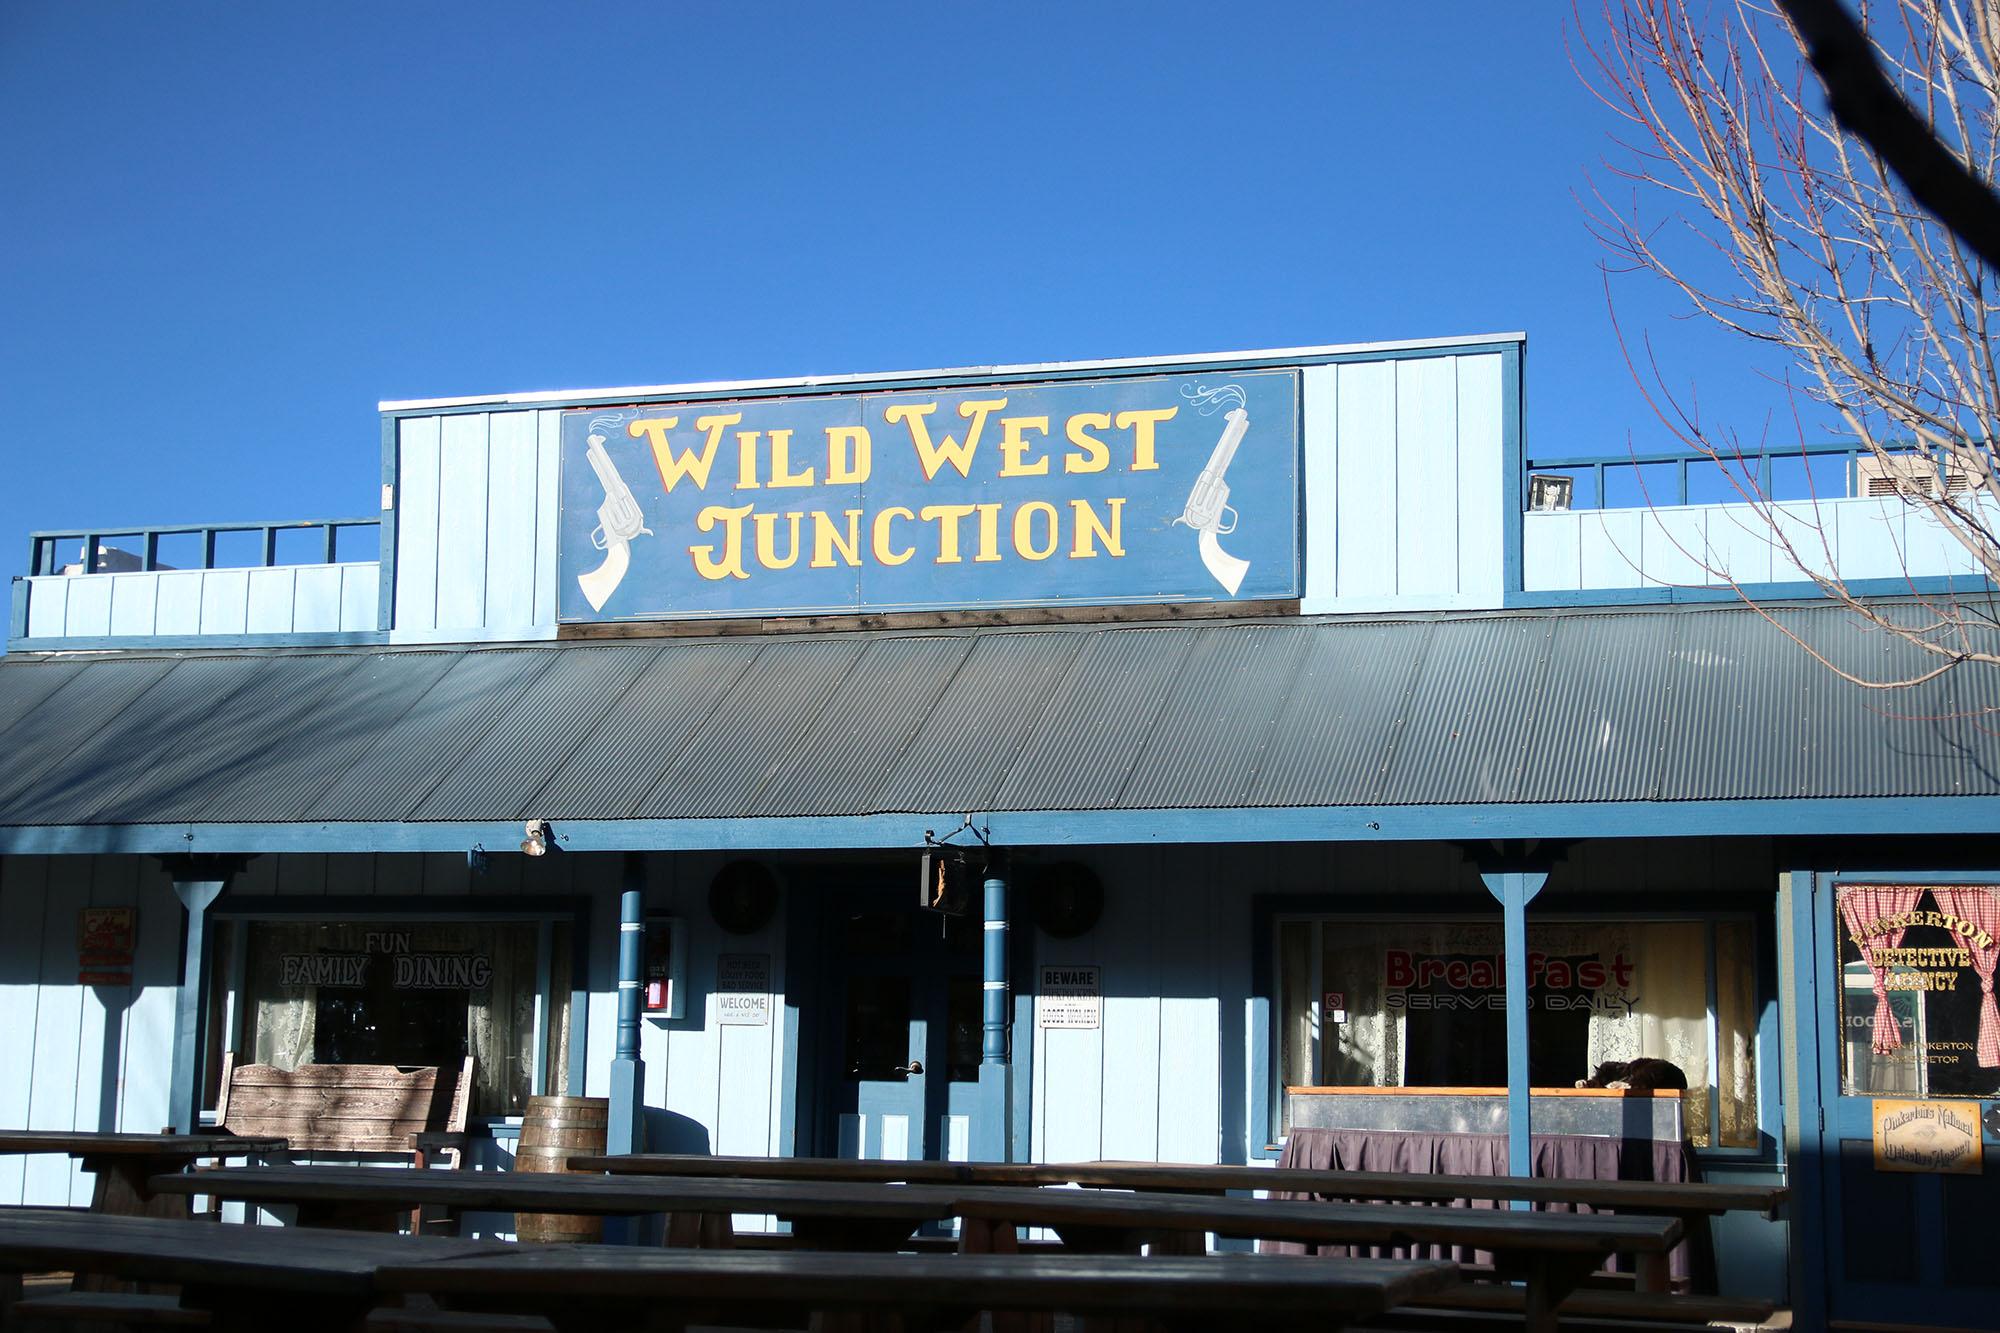 IMG_1958 wild west junction x